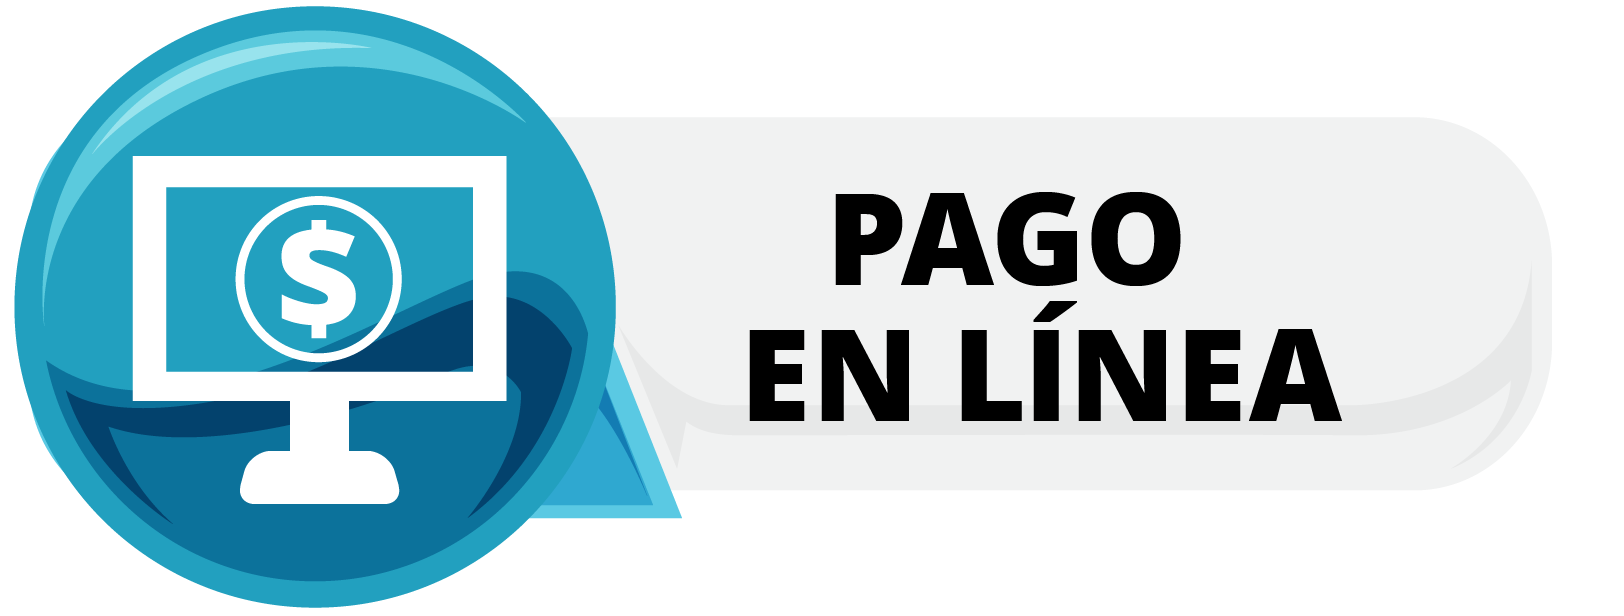 http://www.rocagps.com/blog/wp-content/uploads/2018/09/pago-en-linea